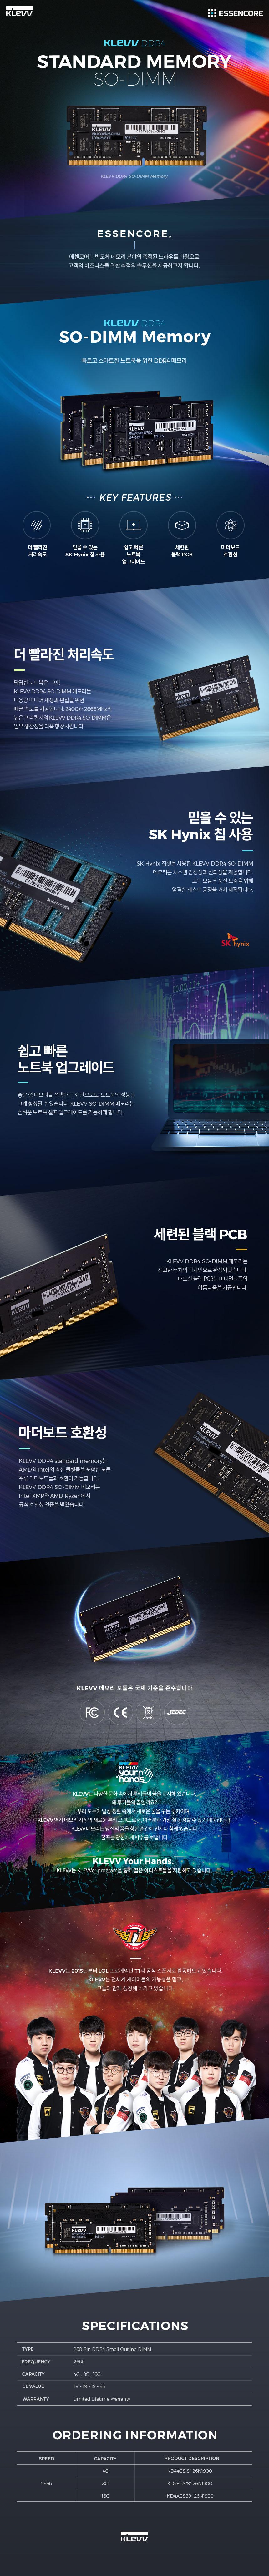 ESSENCORE KLEVV 노트북 DDR4 8G PC4-21300 CL19